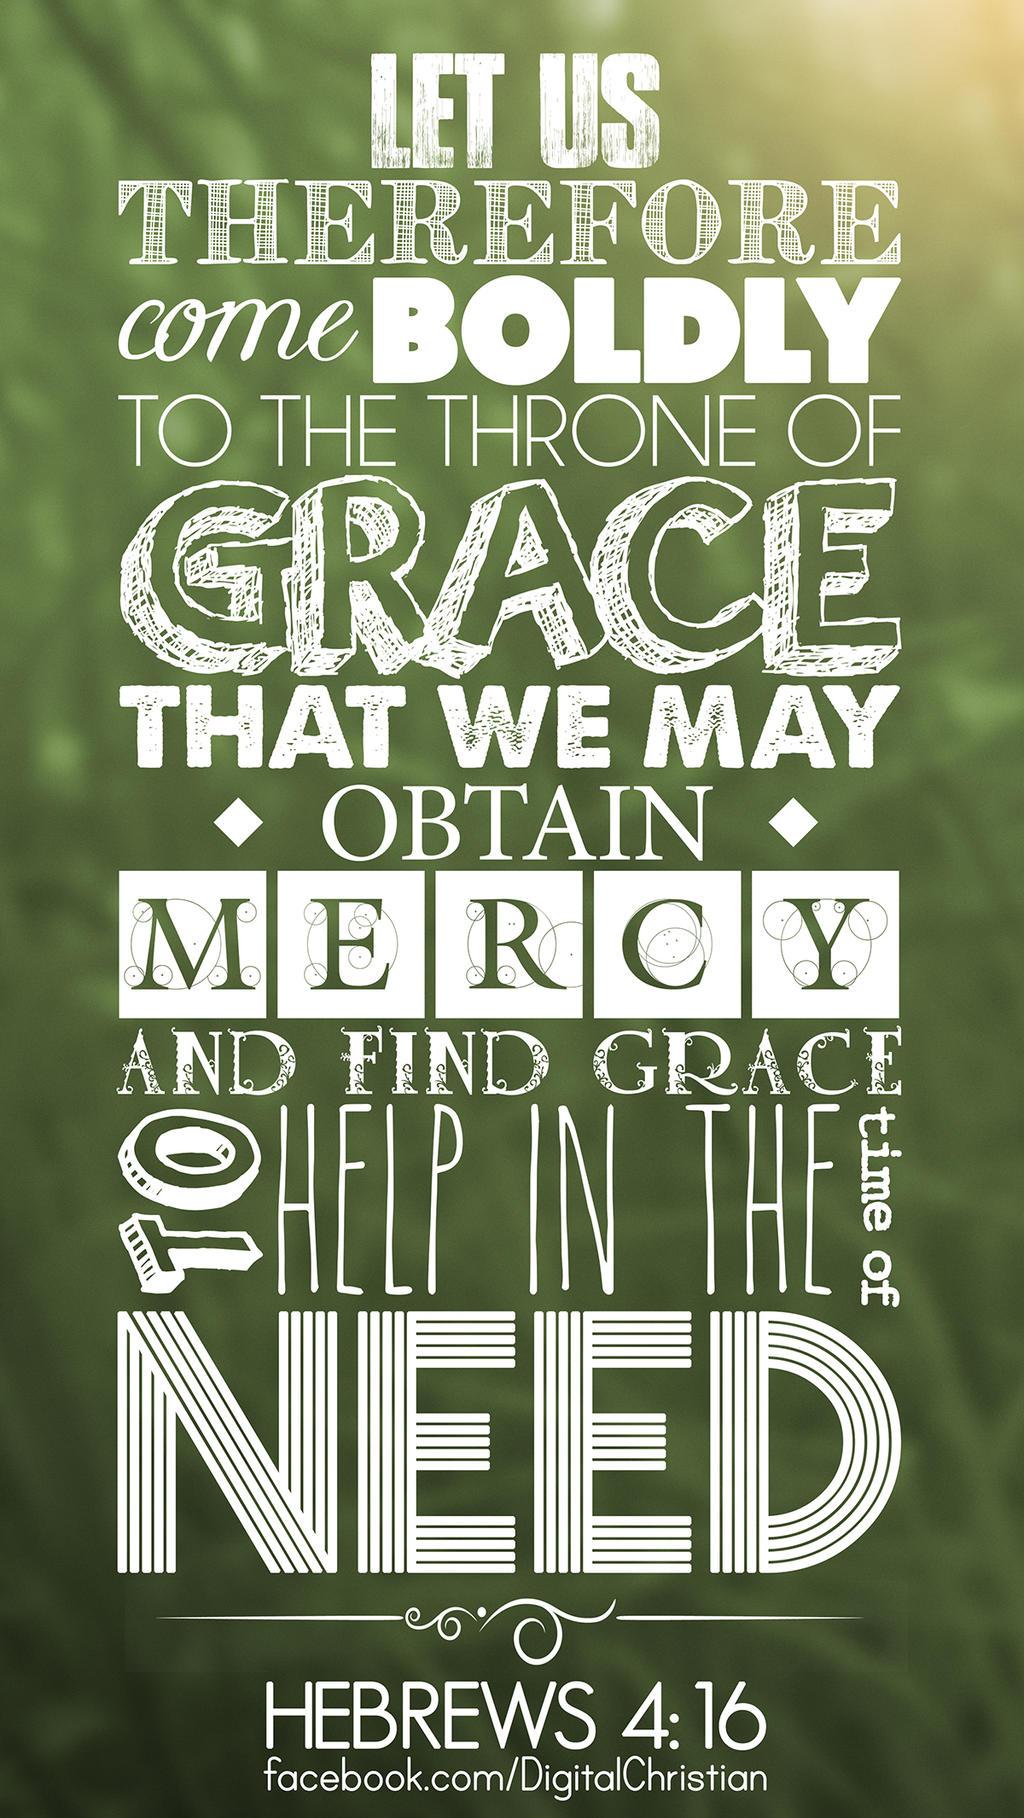 Hebrews 4:16 by kevron2001 on DeviantArt